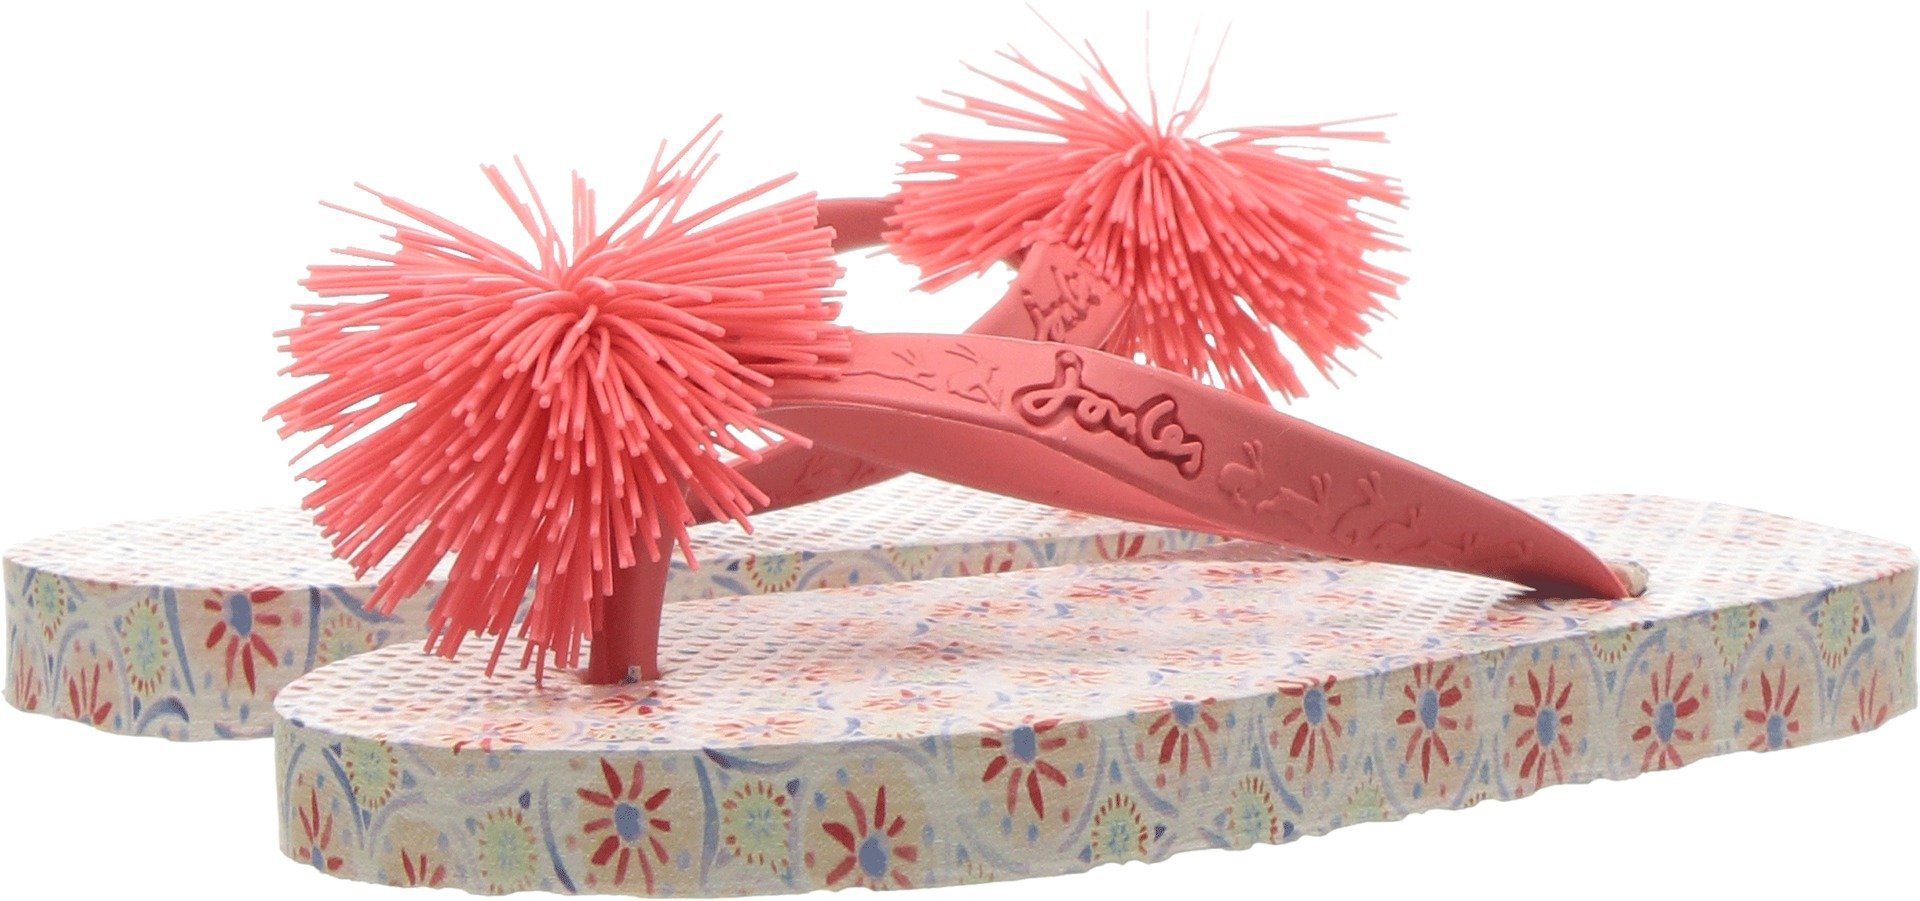 Joules Kids Baby Girl's Flip-Flop (Toddler/Little Kid/Big Kid) Cream Summer Mosaic 9 M US Toddler